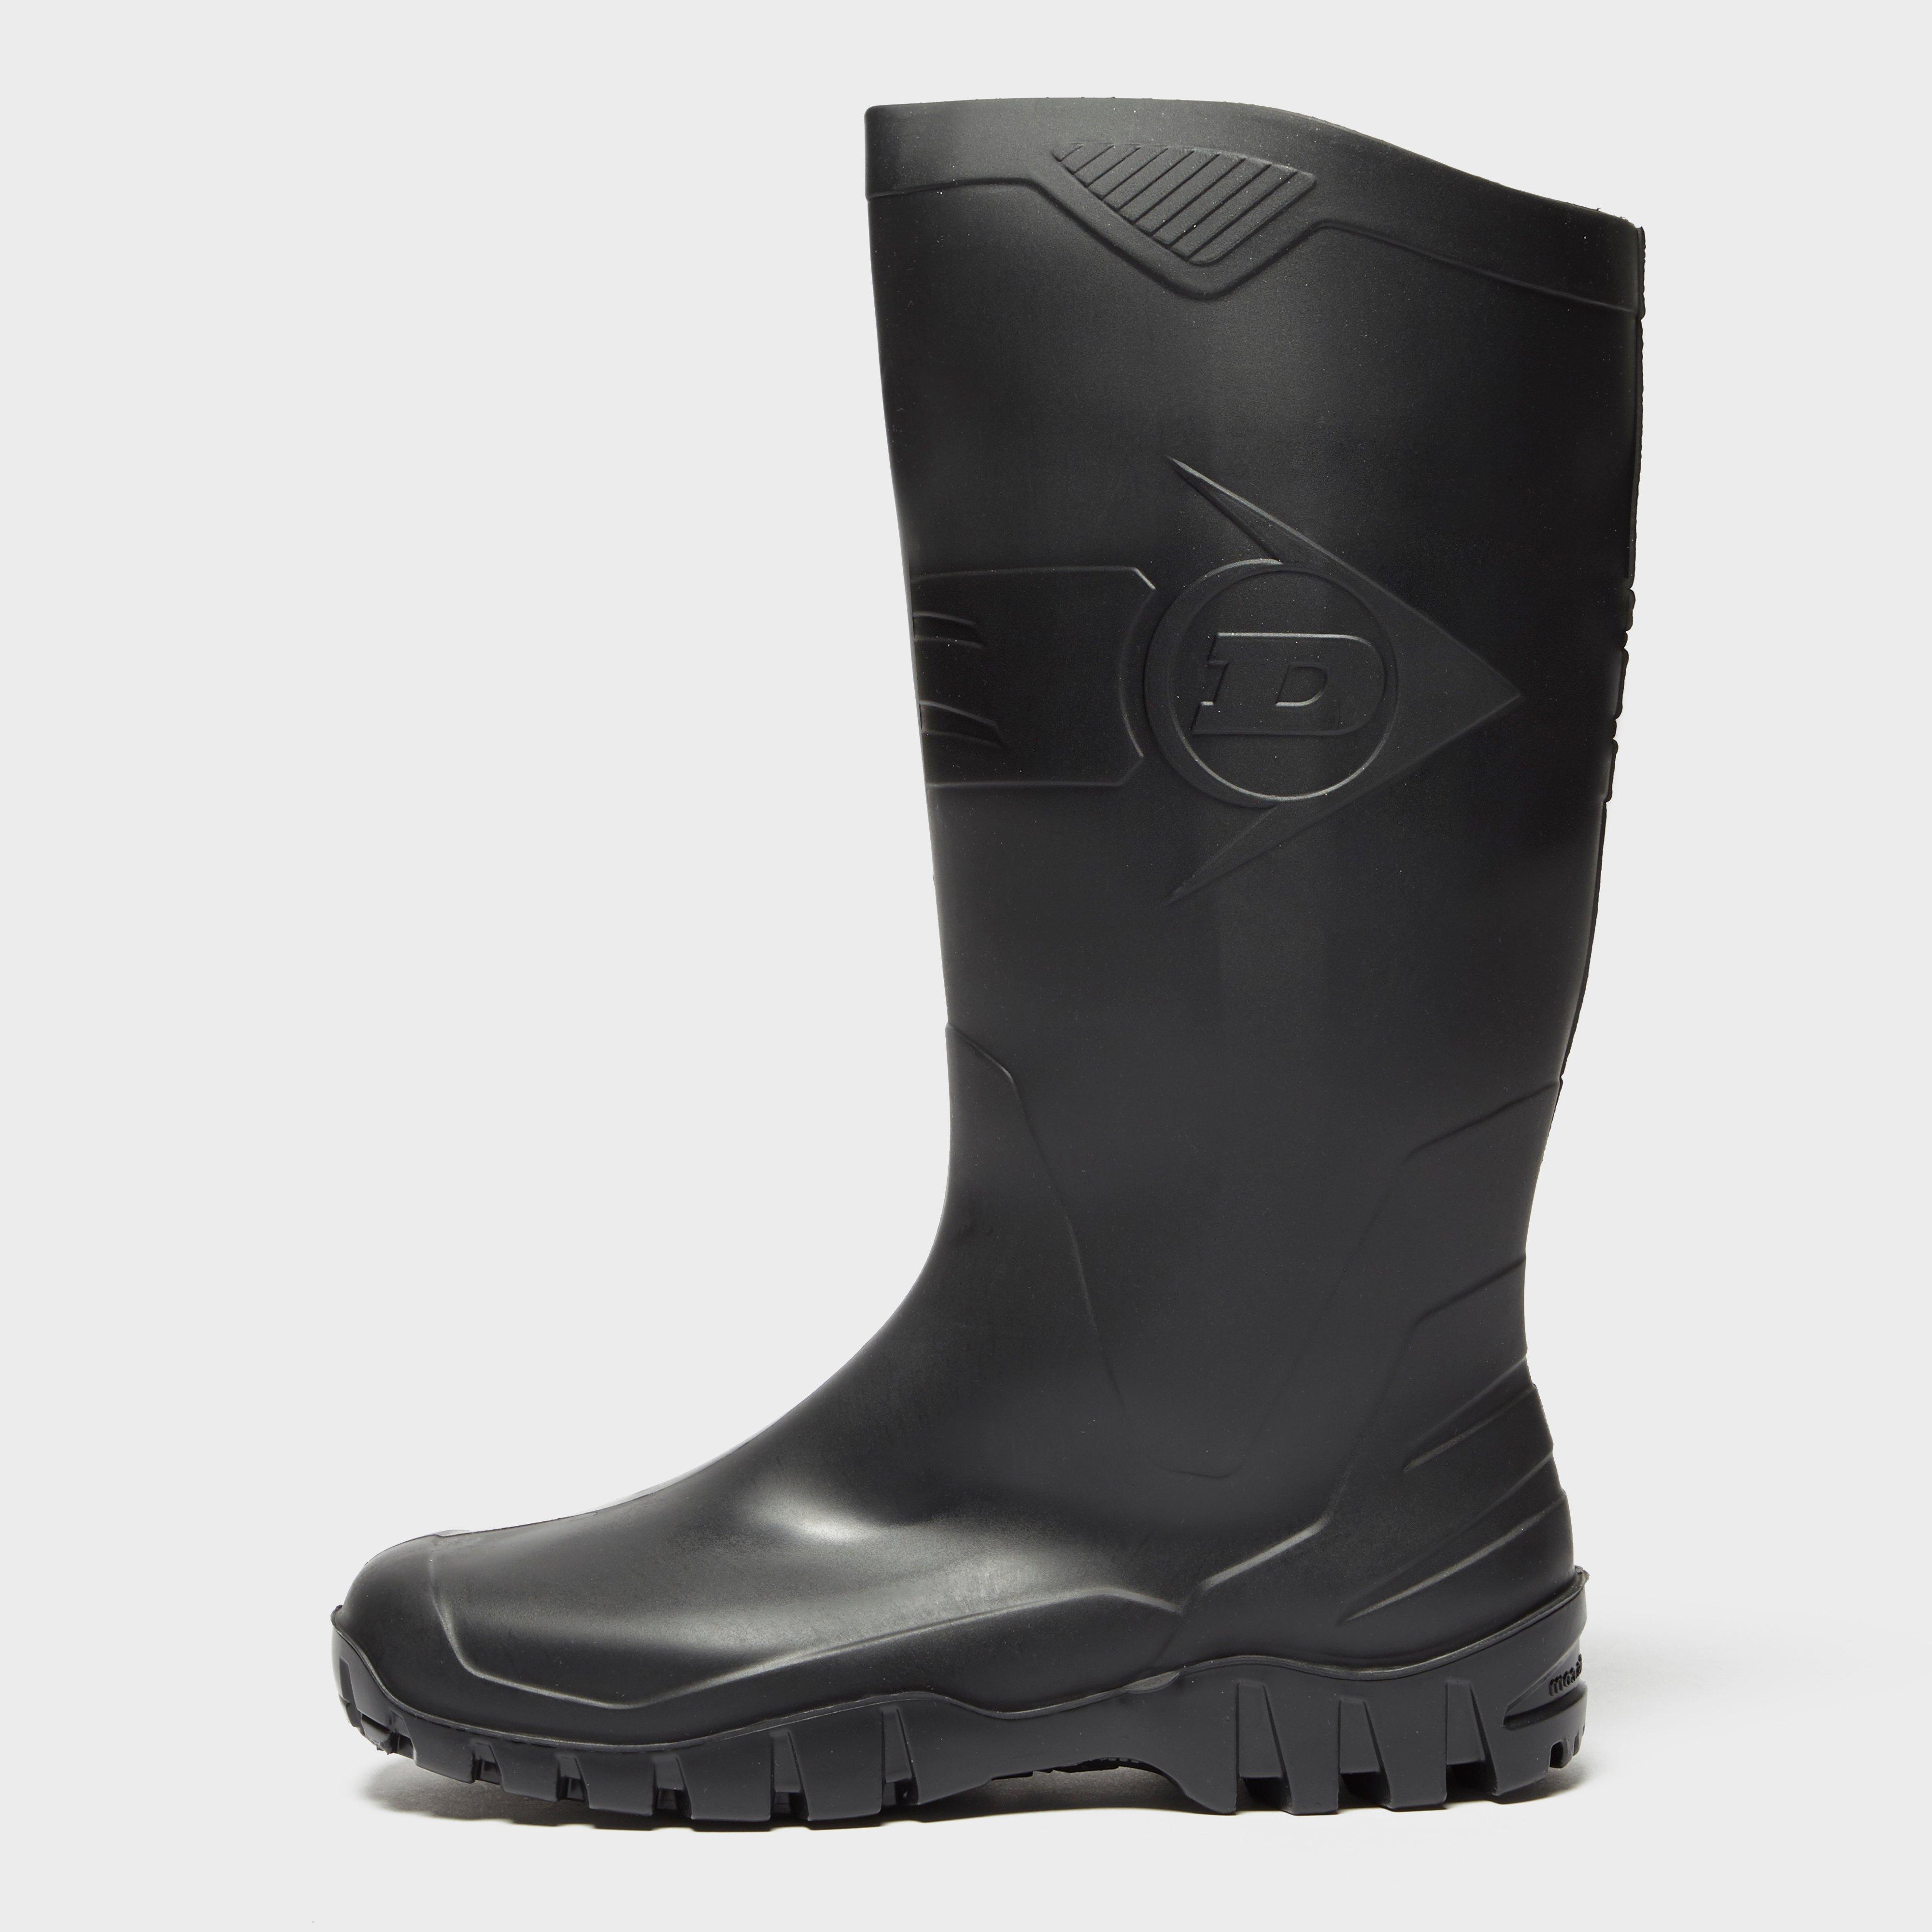 Dunlop Dunlop Mens Dane Wellies - Black, Black